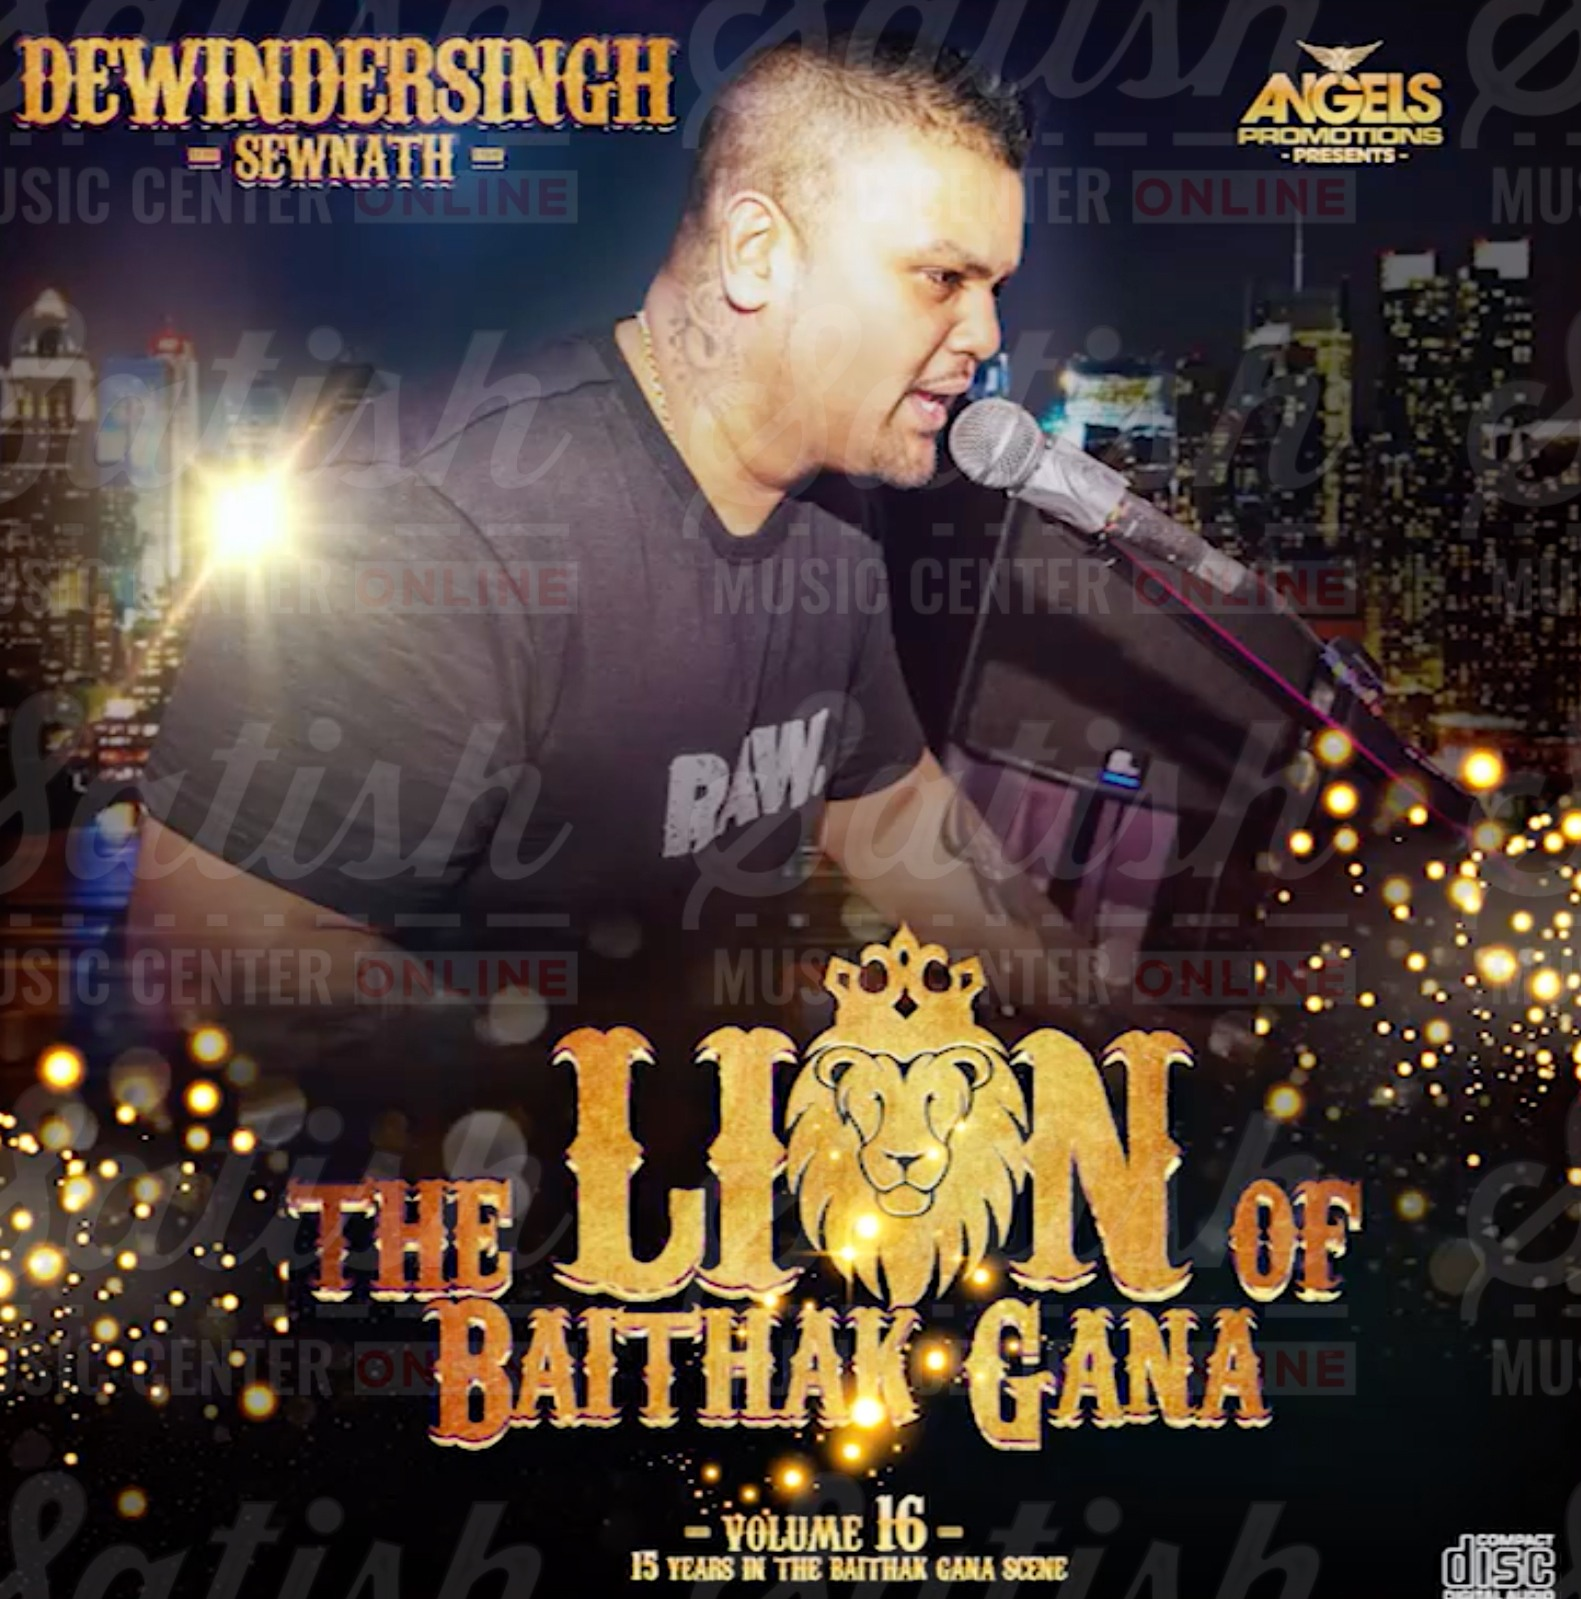 Chennai Gana Praba New Song 2019: THE LION OF BAITHAK GANA VOL. 16